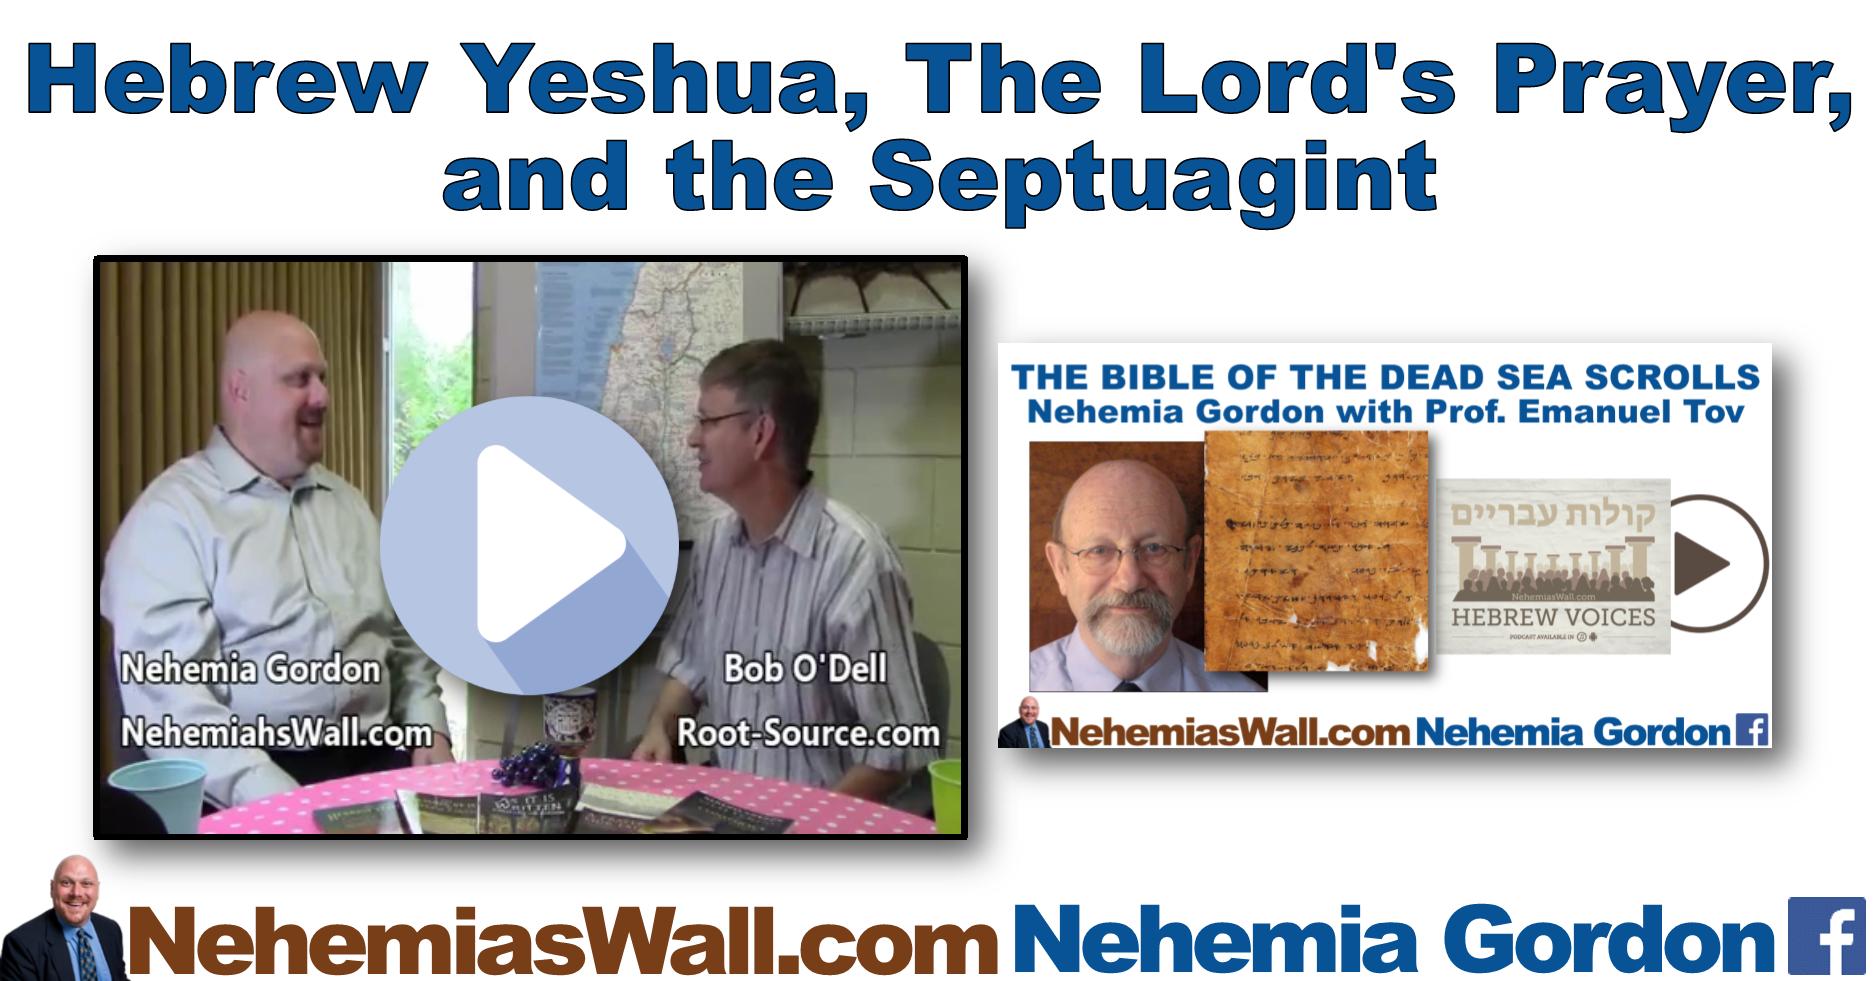 How Jews View the Septuagint - NehemiasWall.comNehemia's Wall